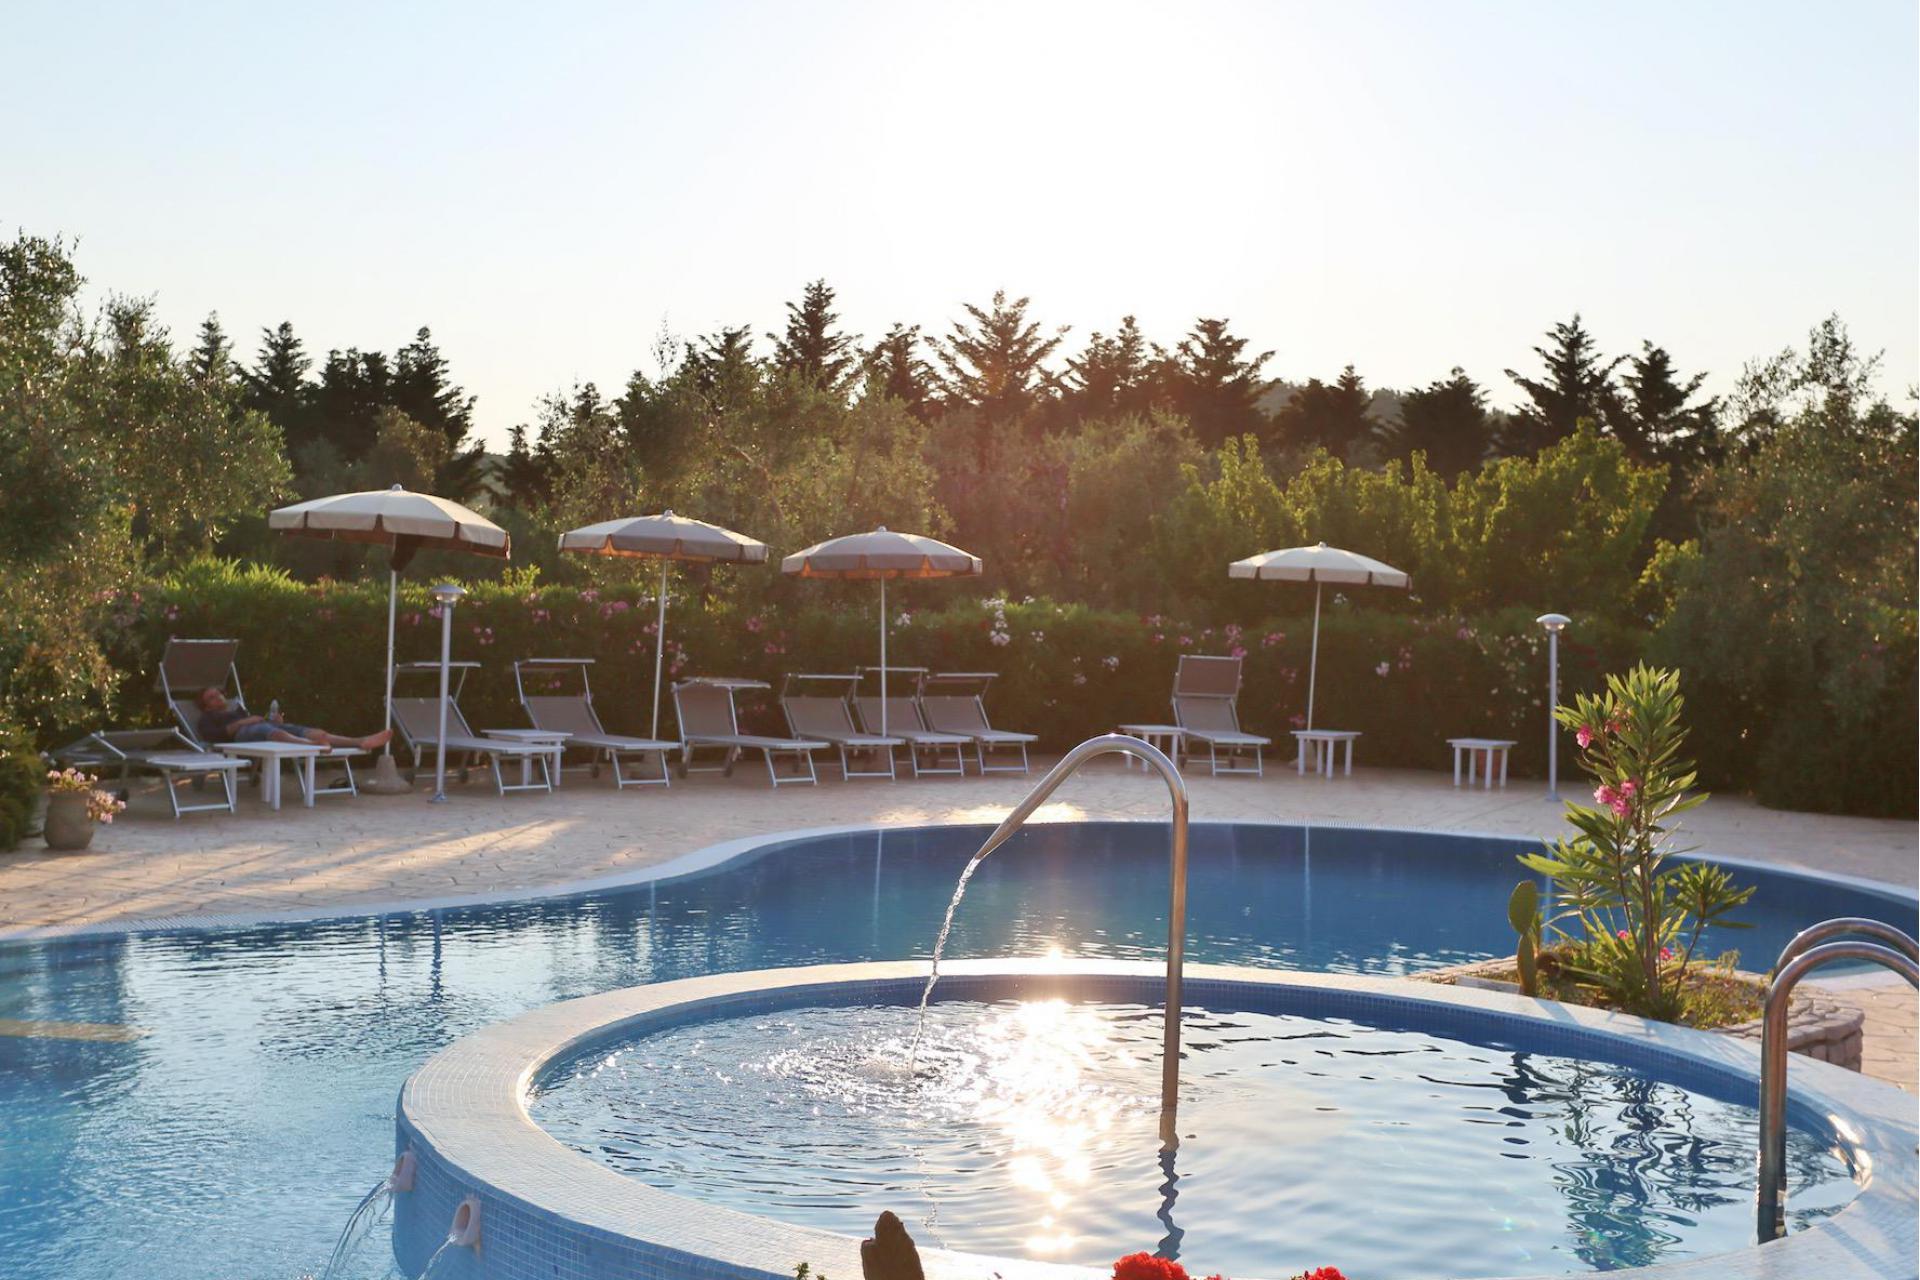 Agriturismo Puglia Kindvriendelijke Agriturismo in Puglia bij zee en strand